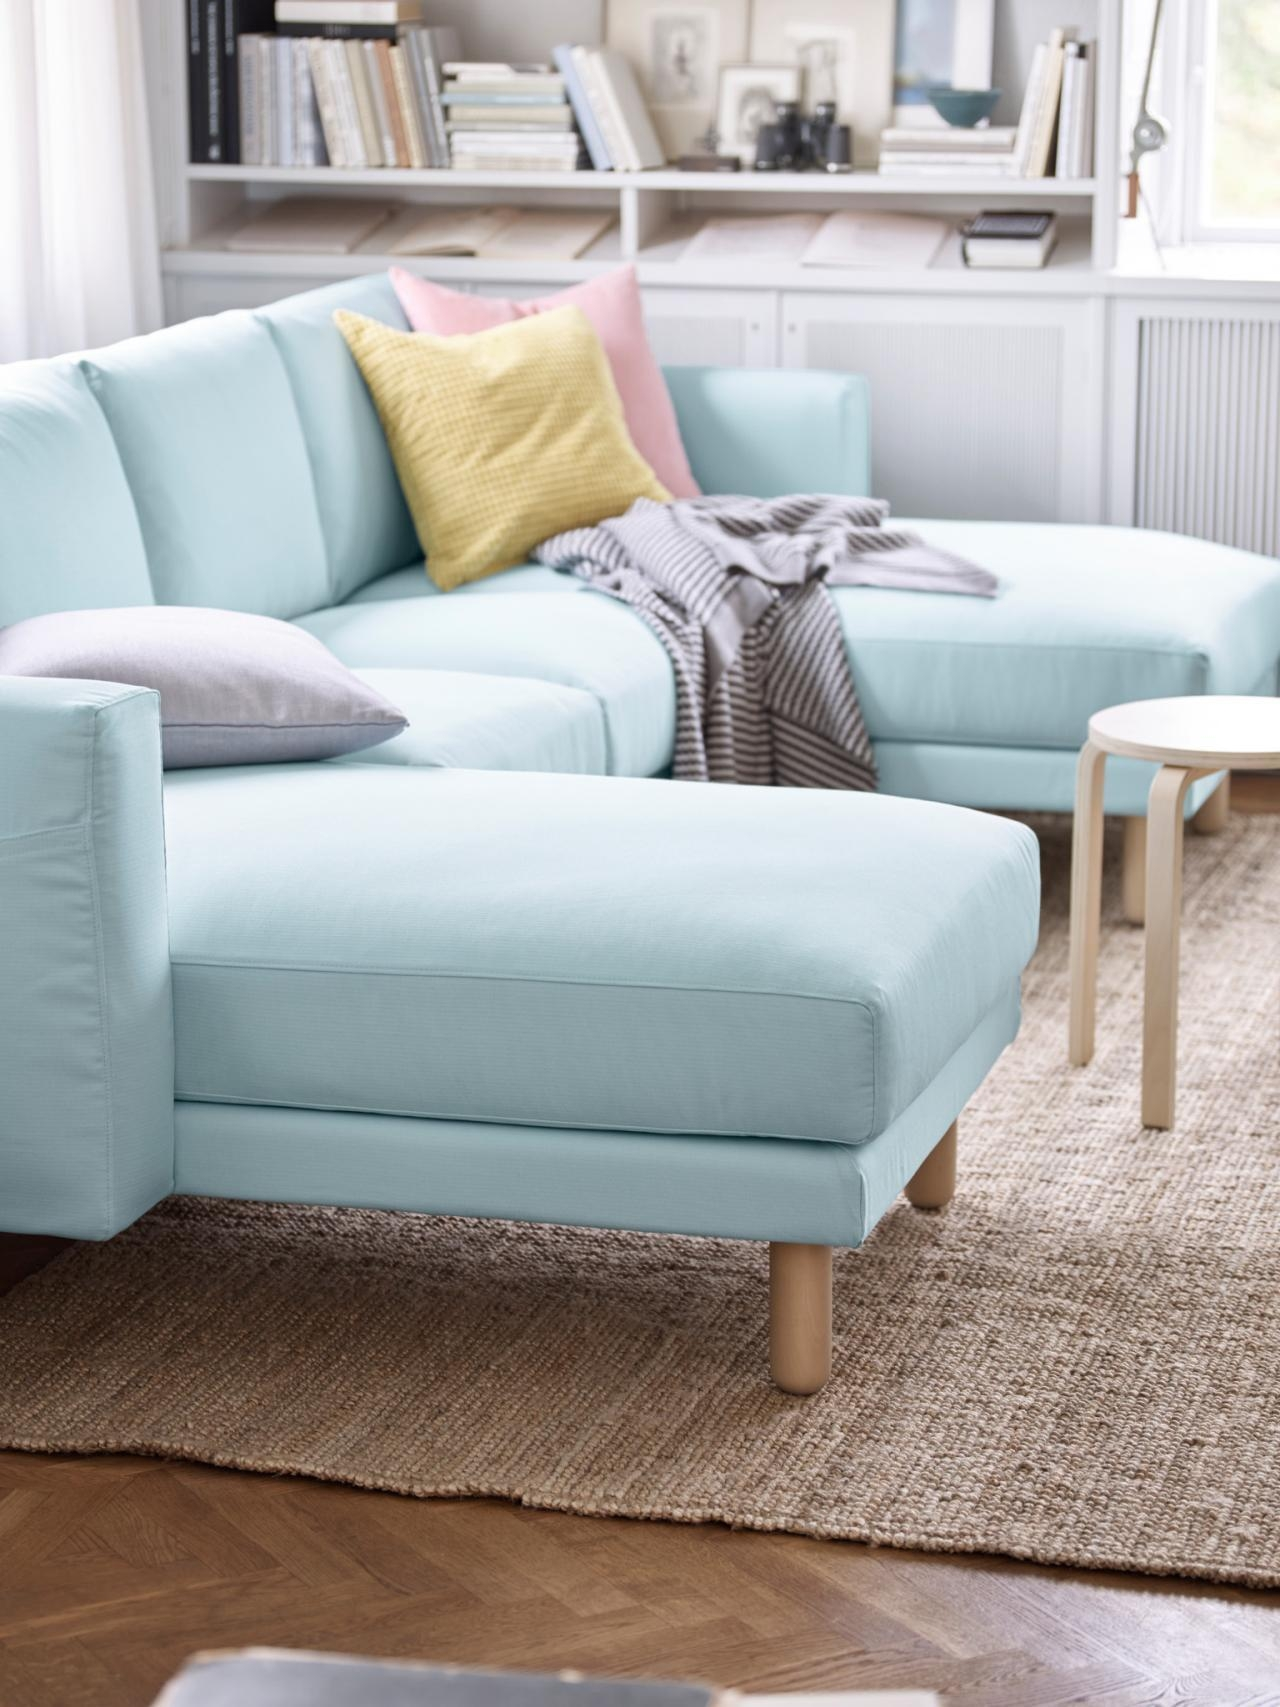 5 Apartment Sized Sofas That Are Lifesavers | Hgtv's Decorating With Regard To Narrow Depth Sofas (Image 2 of 20)